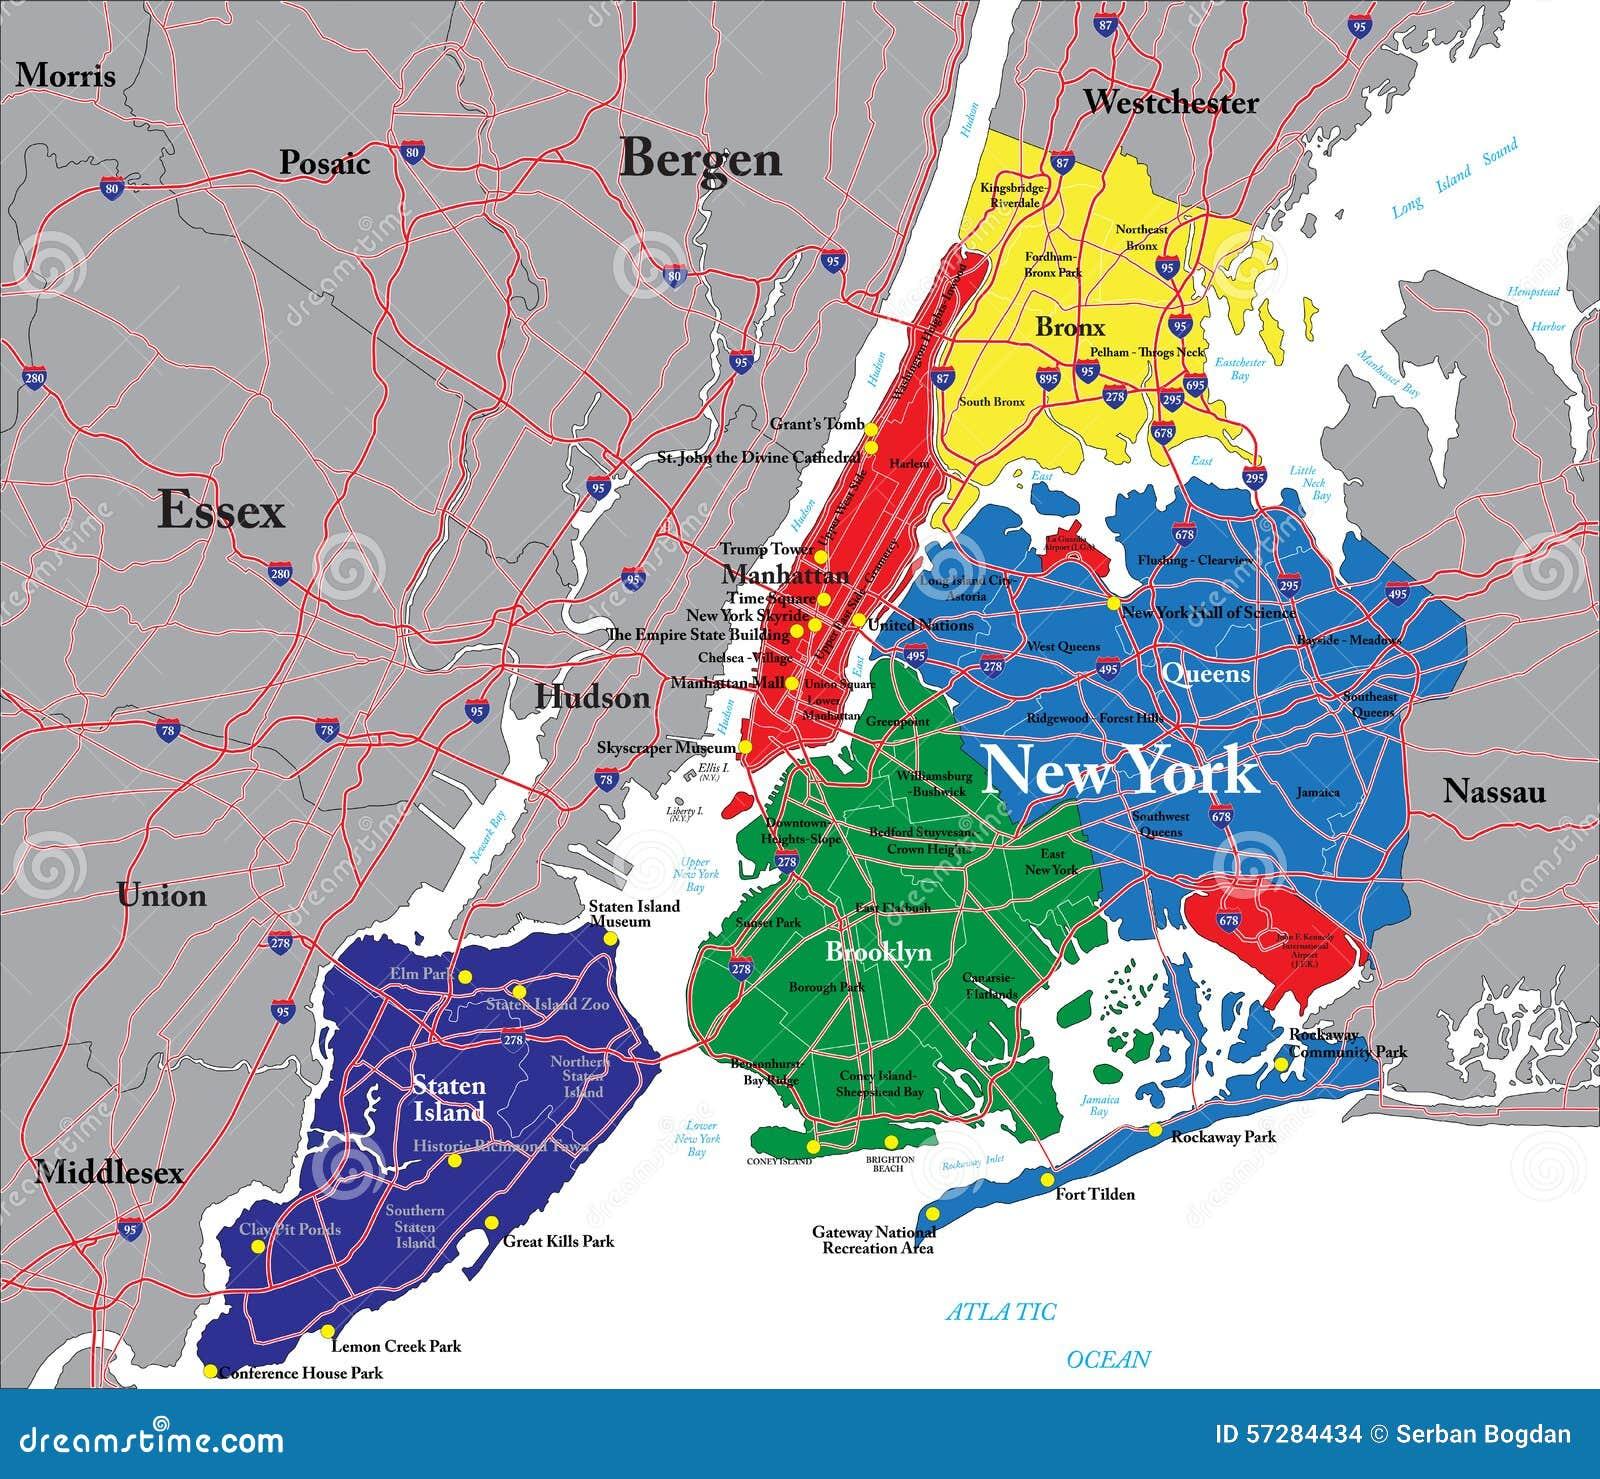 Download mappa turistica new york